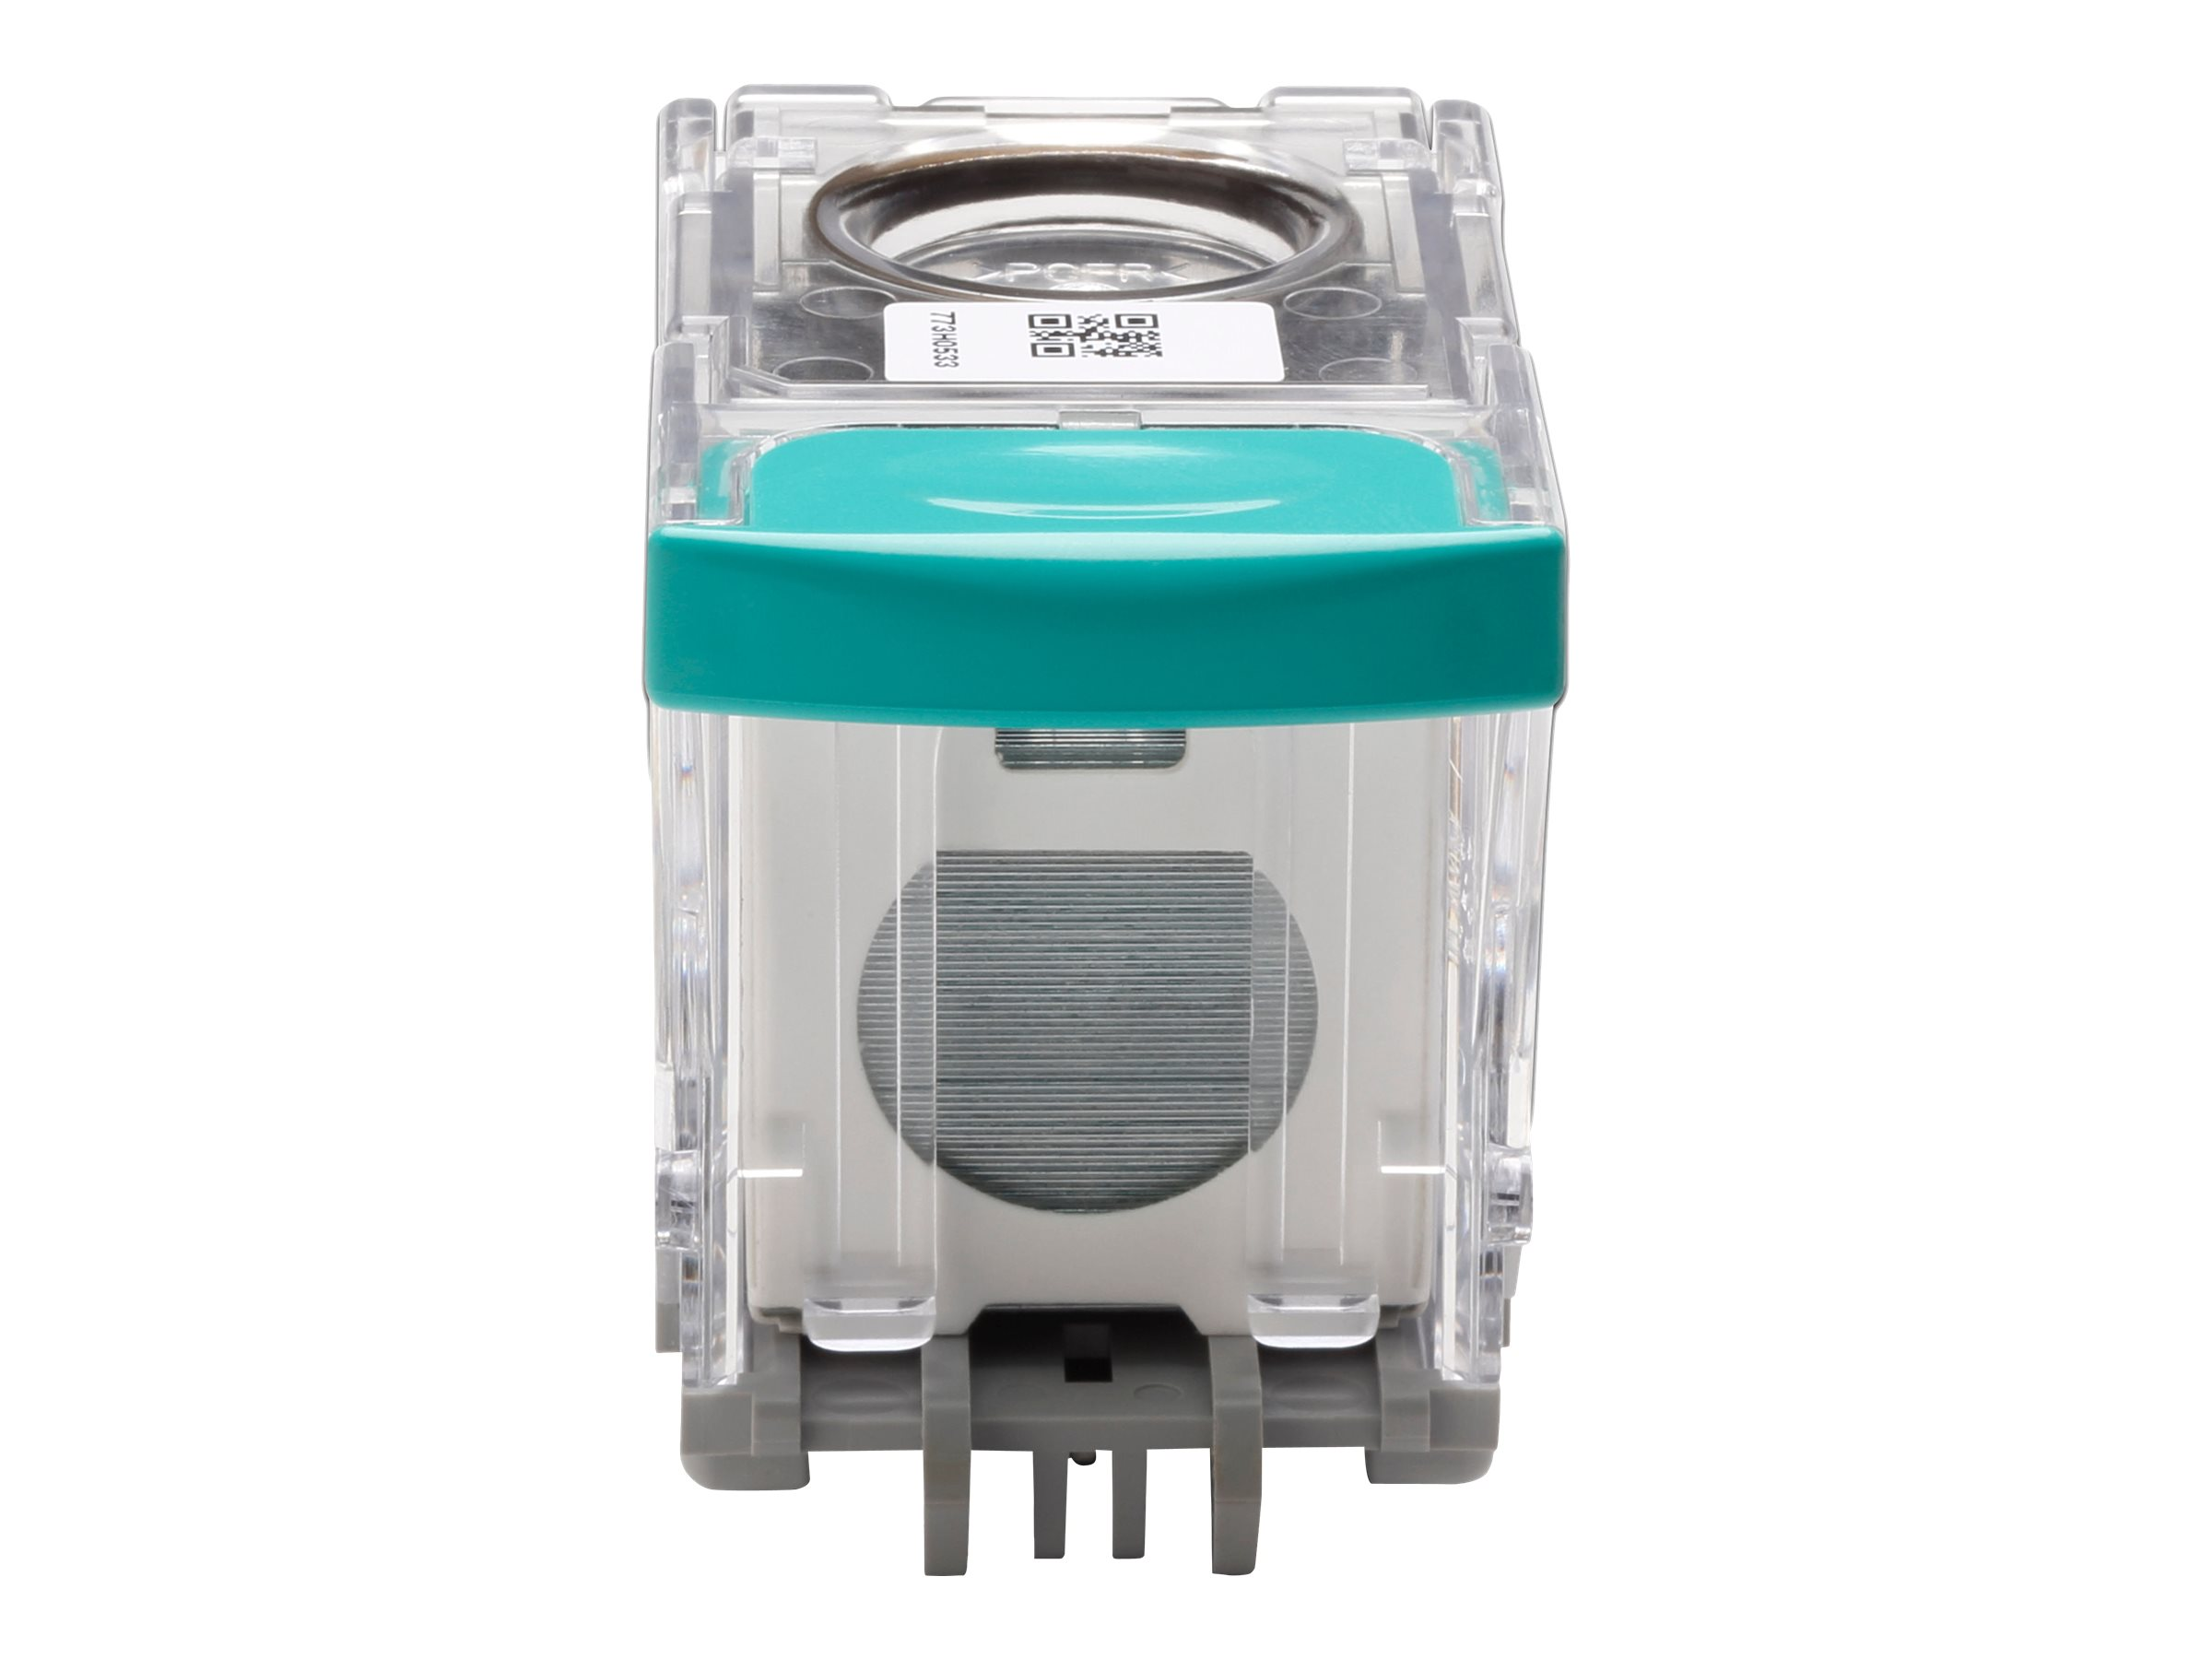 HP - 3 Stck. Heftkartusche - für Color LaserJet 8550; LaserJet 8000, 8100, 8150; Mopier 320